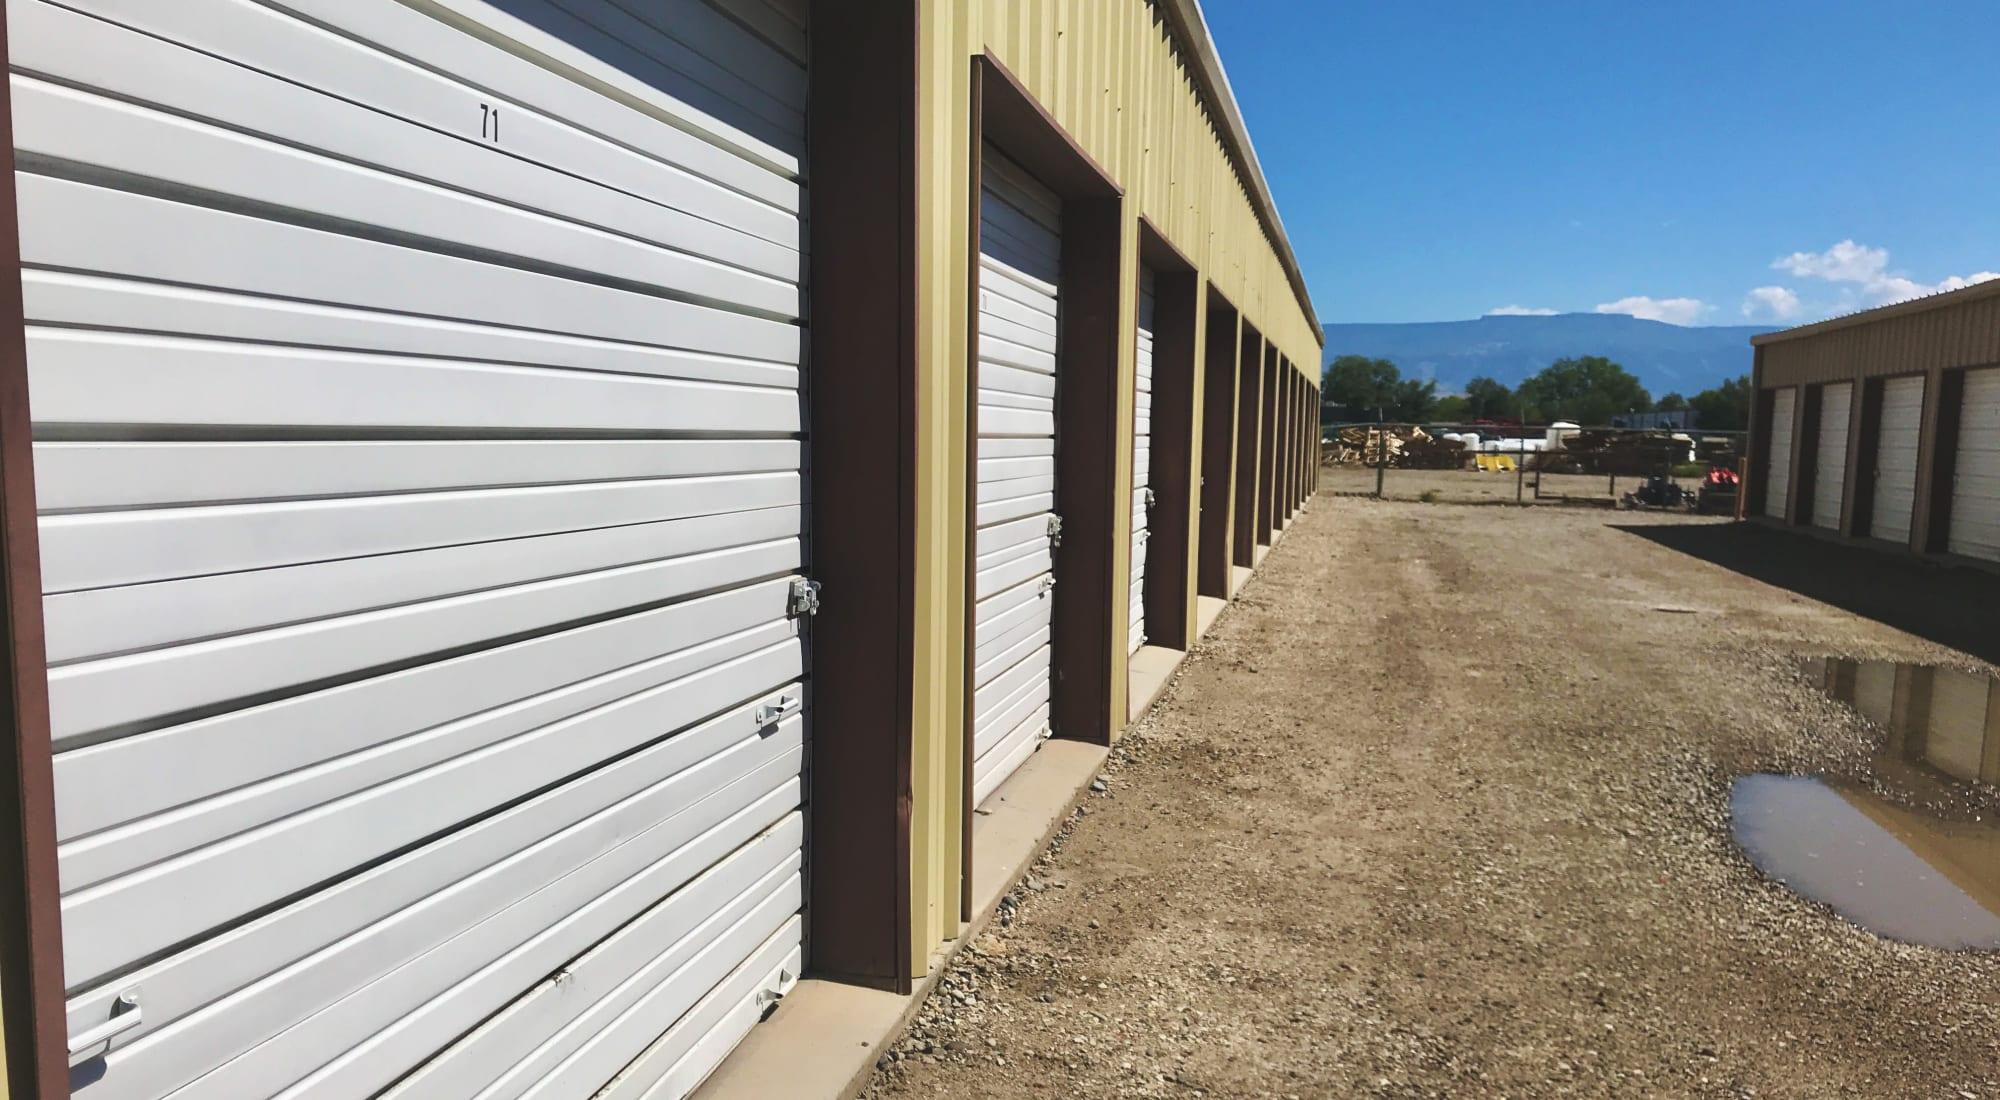 603 Storage - Dudley self storage in Raymond, New Hampshire